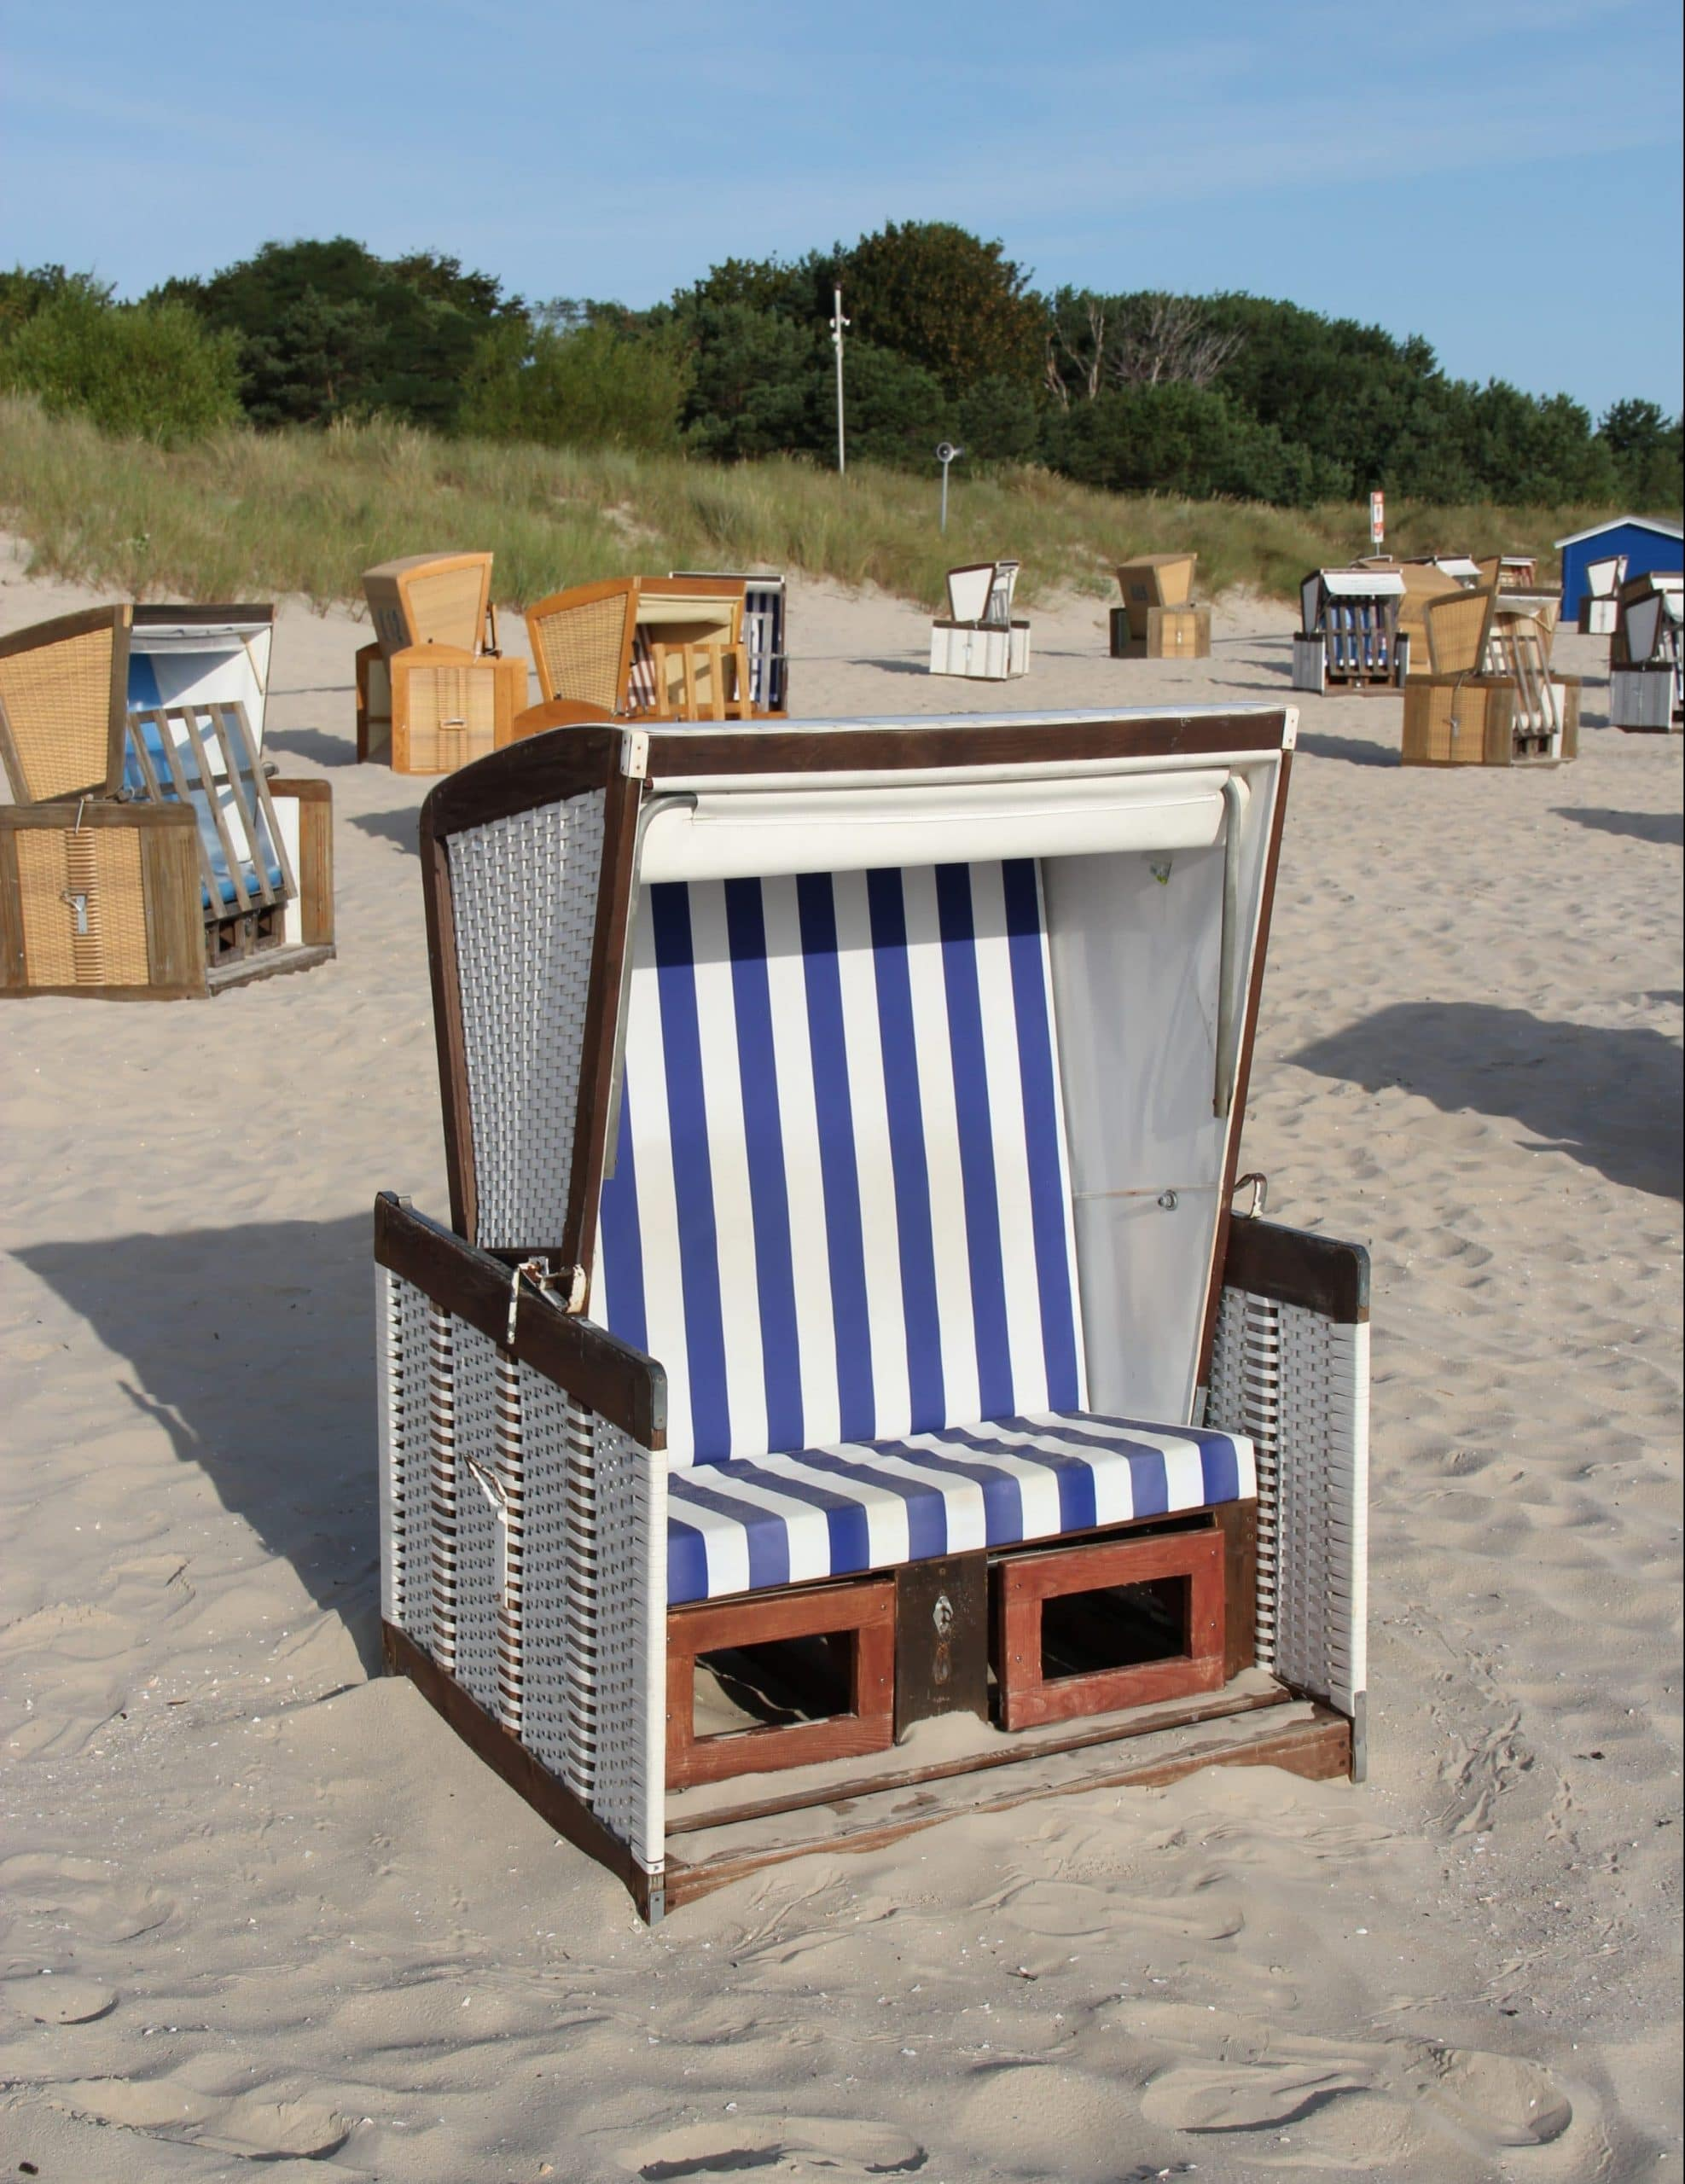 Strandkorb mieten Usedom